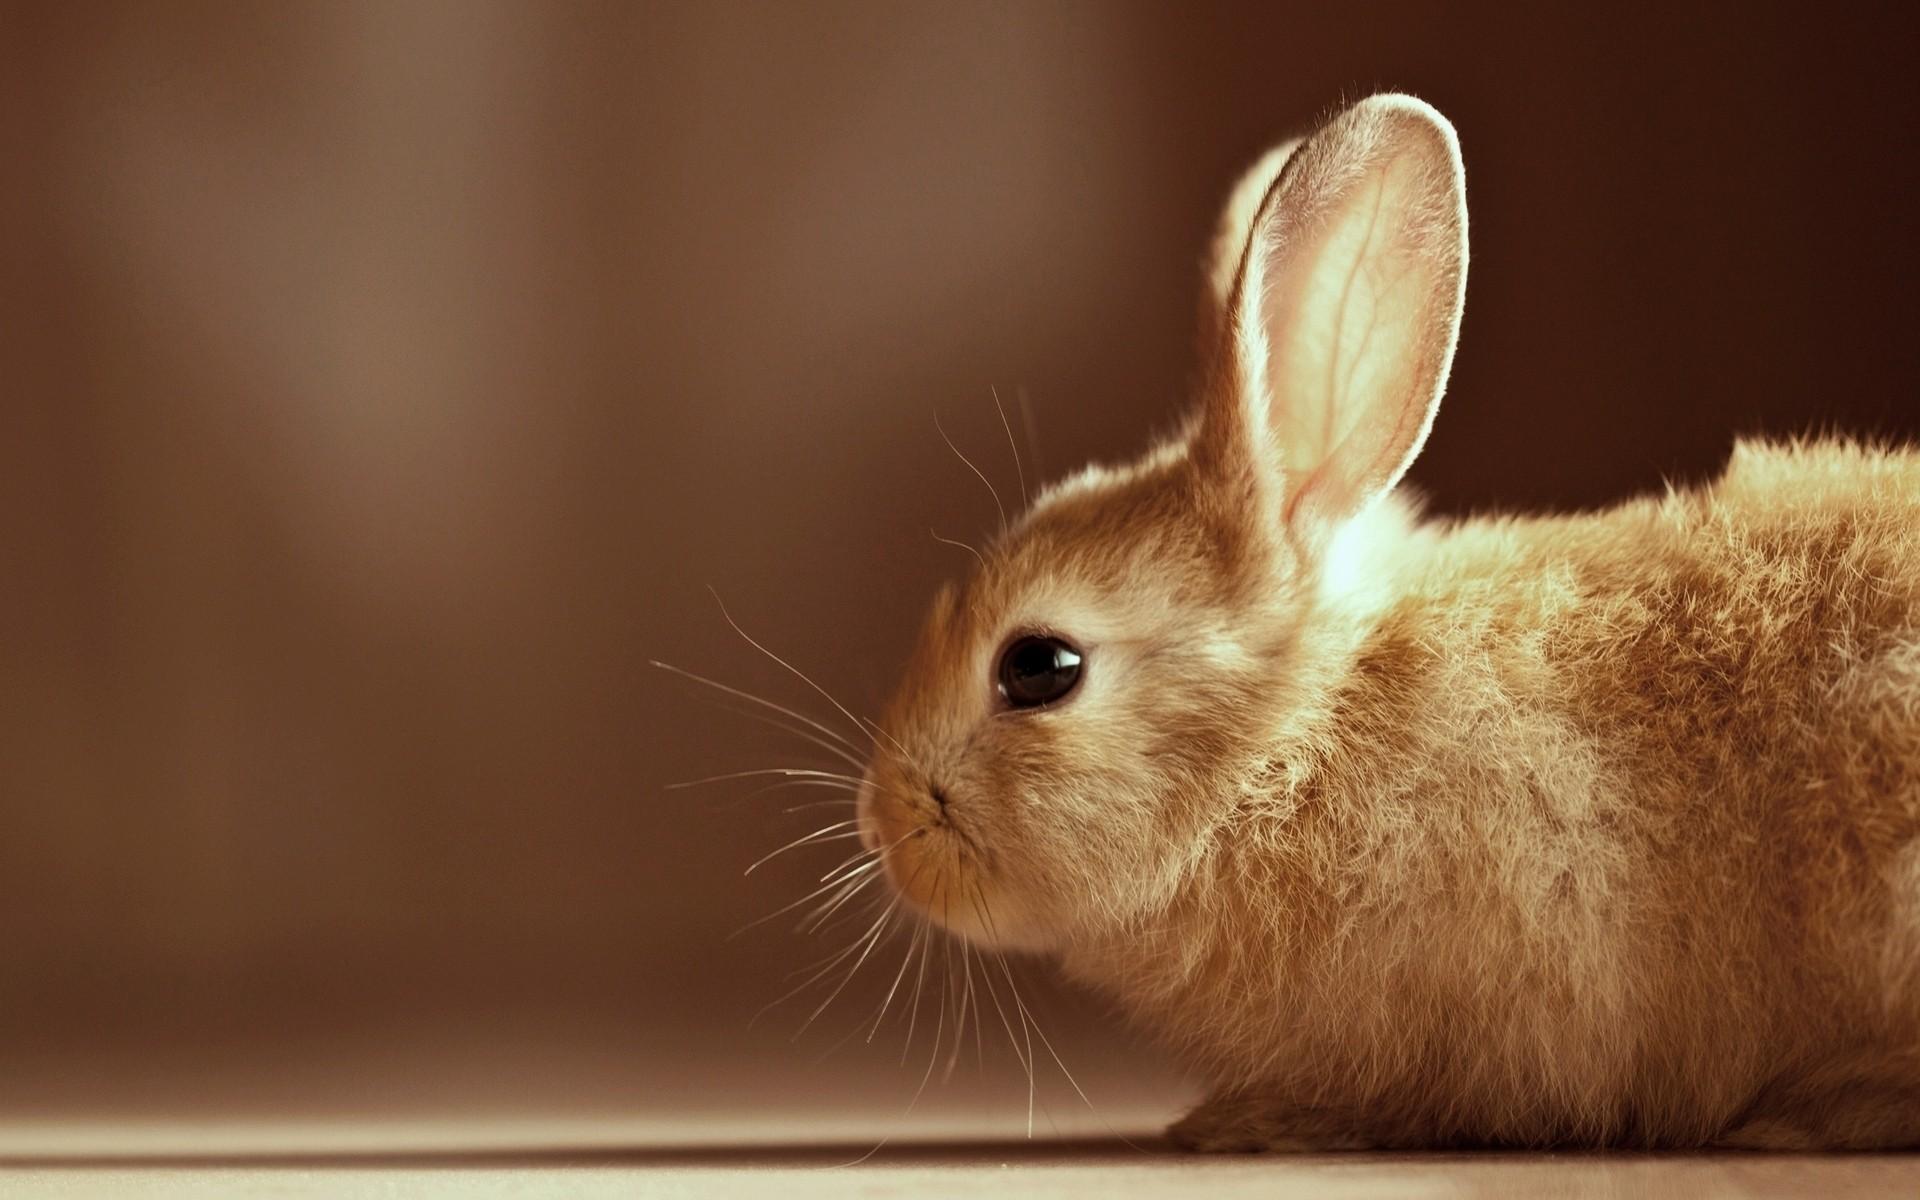 rabbit pictures hd